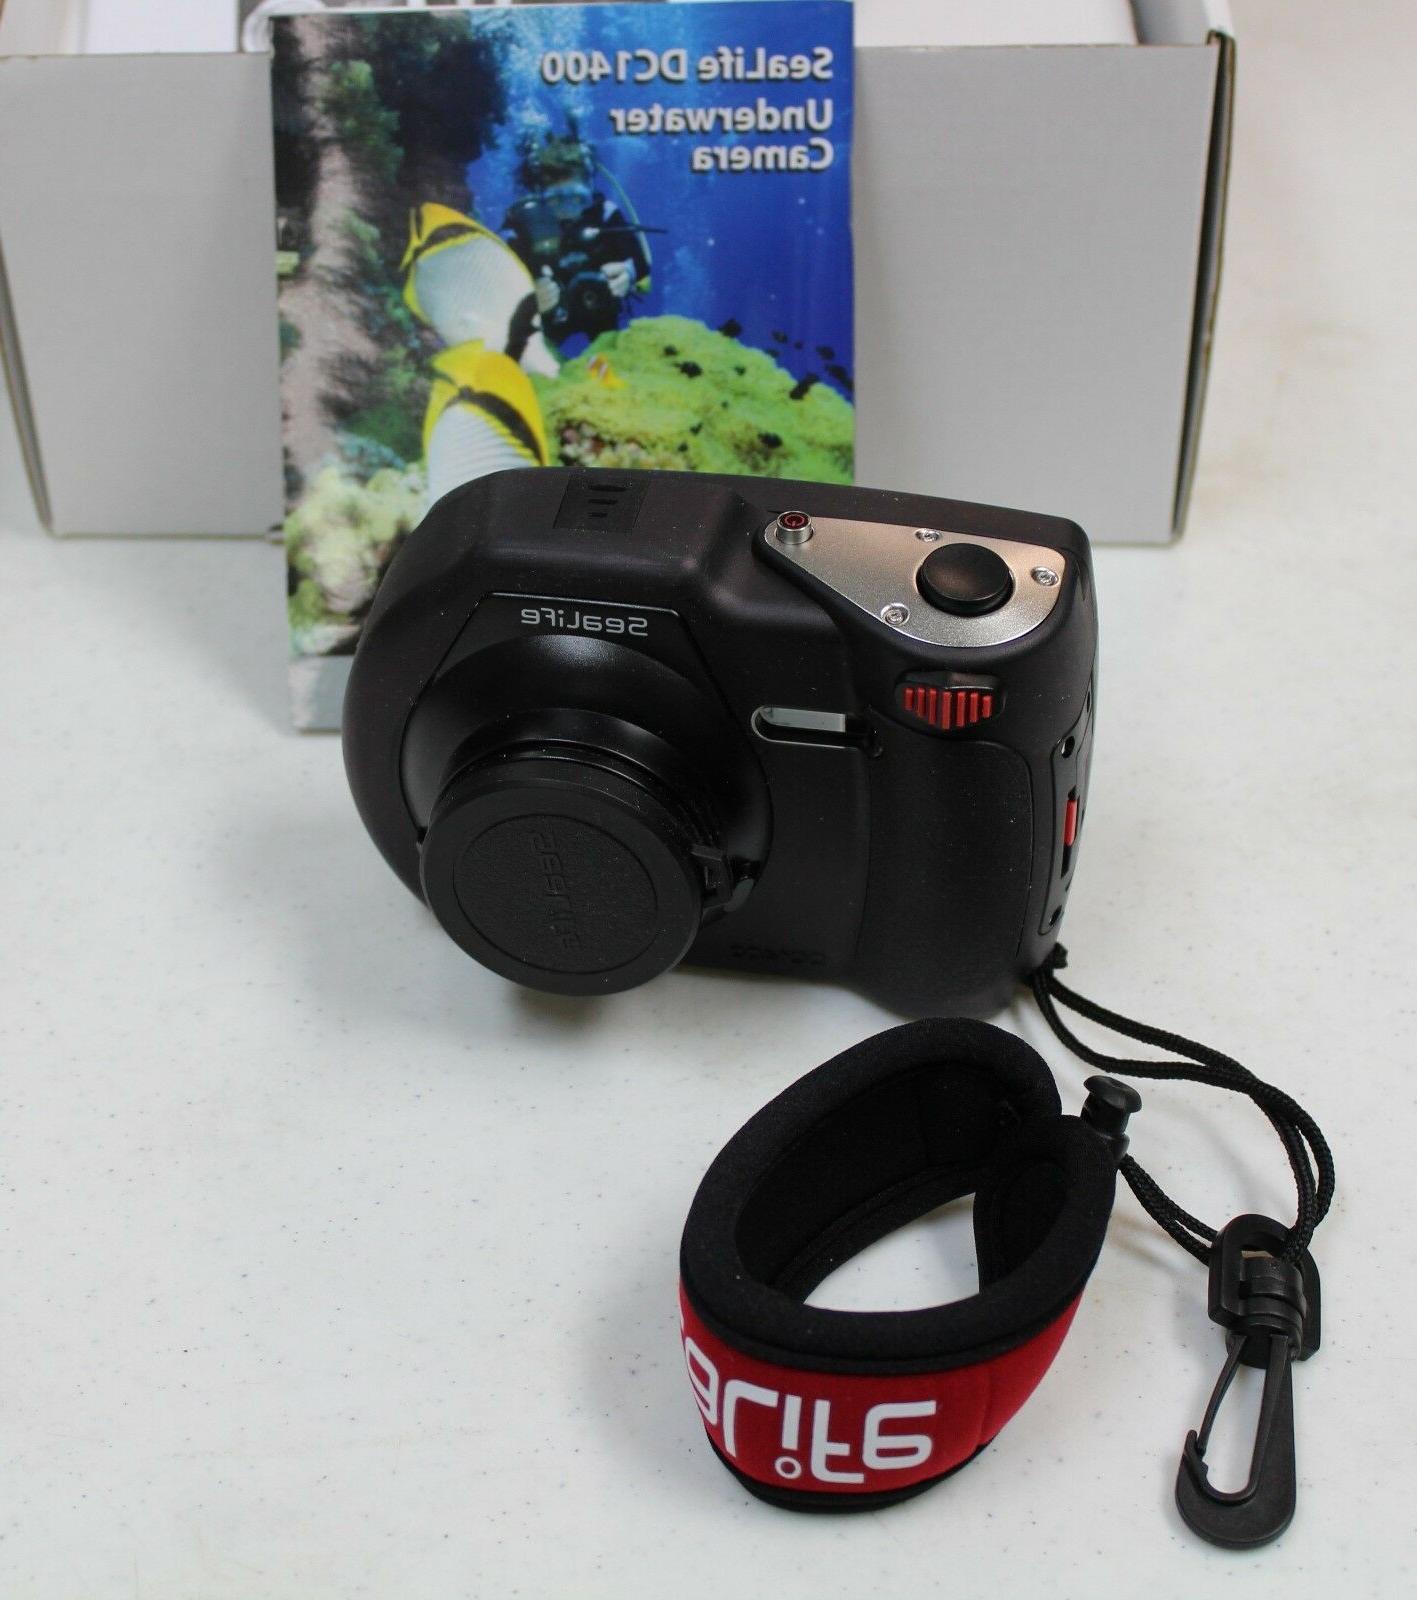 Sealife DC1400 Digital Camera Strobe and